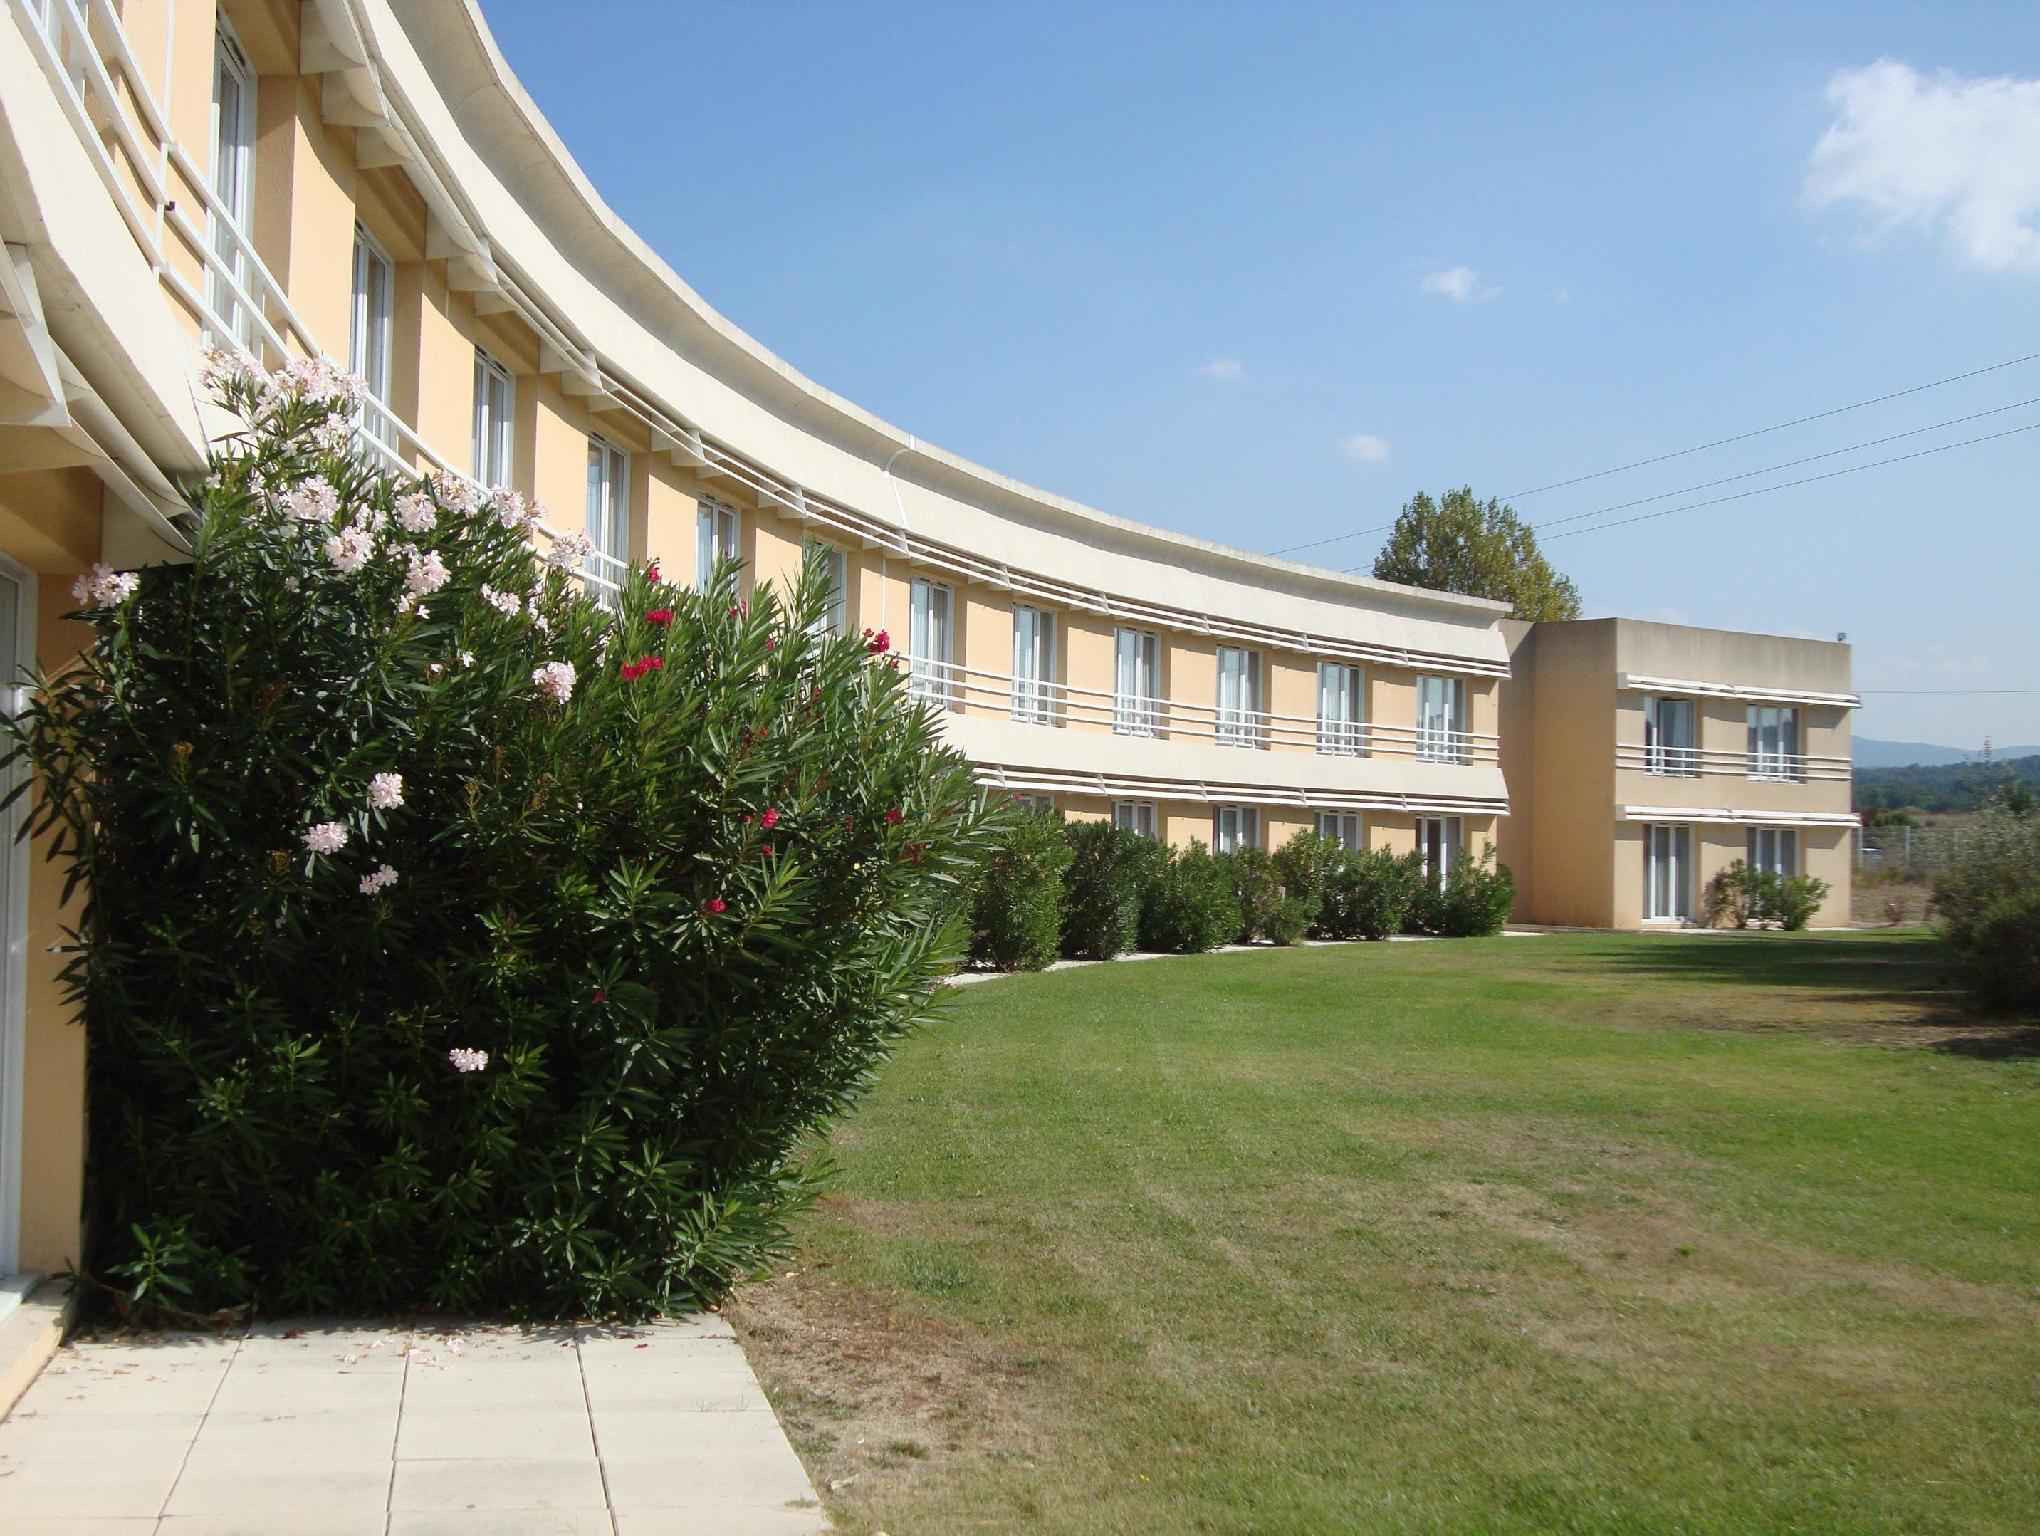 Hotel Aix Sainte Victoire